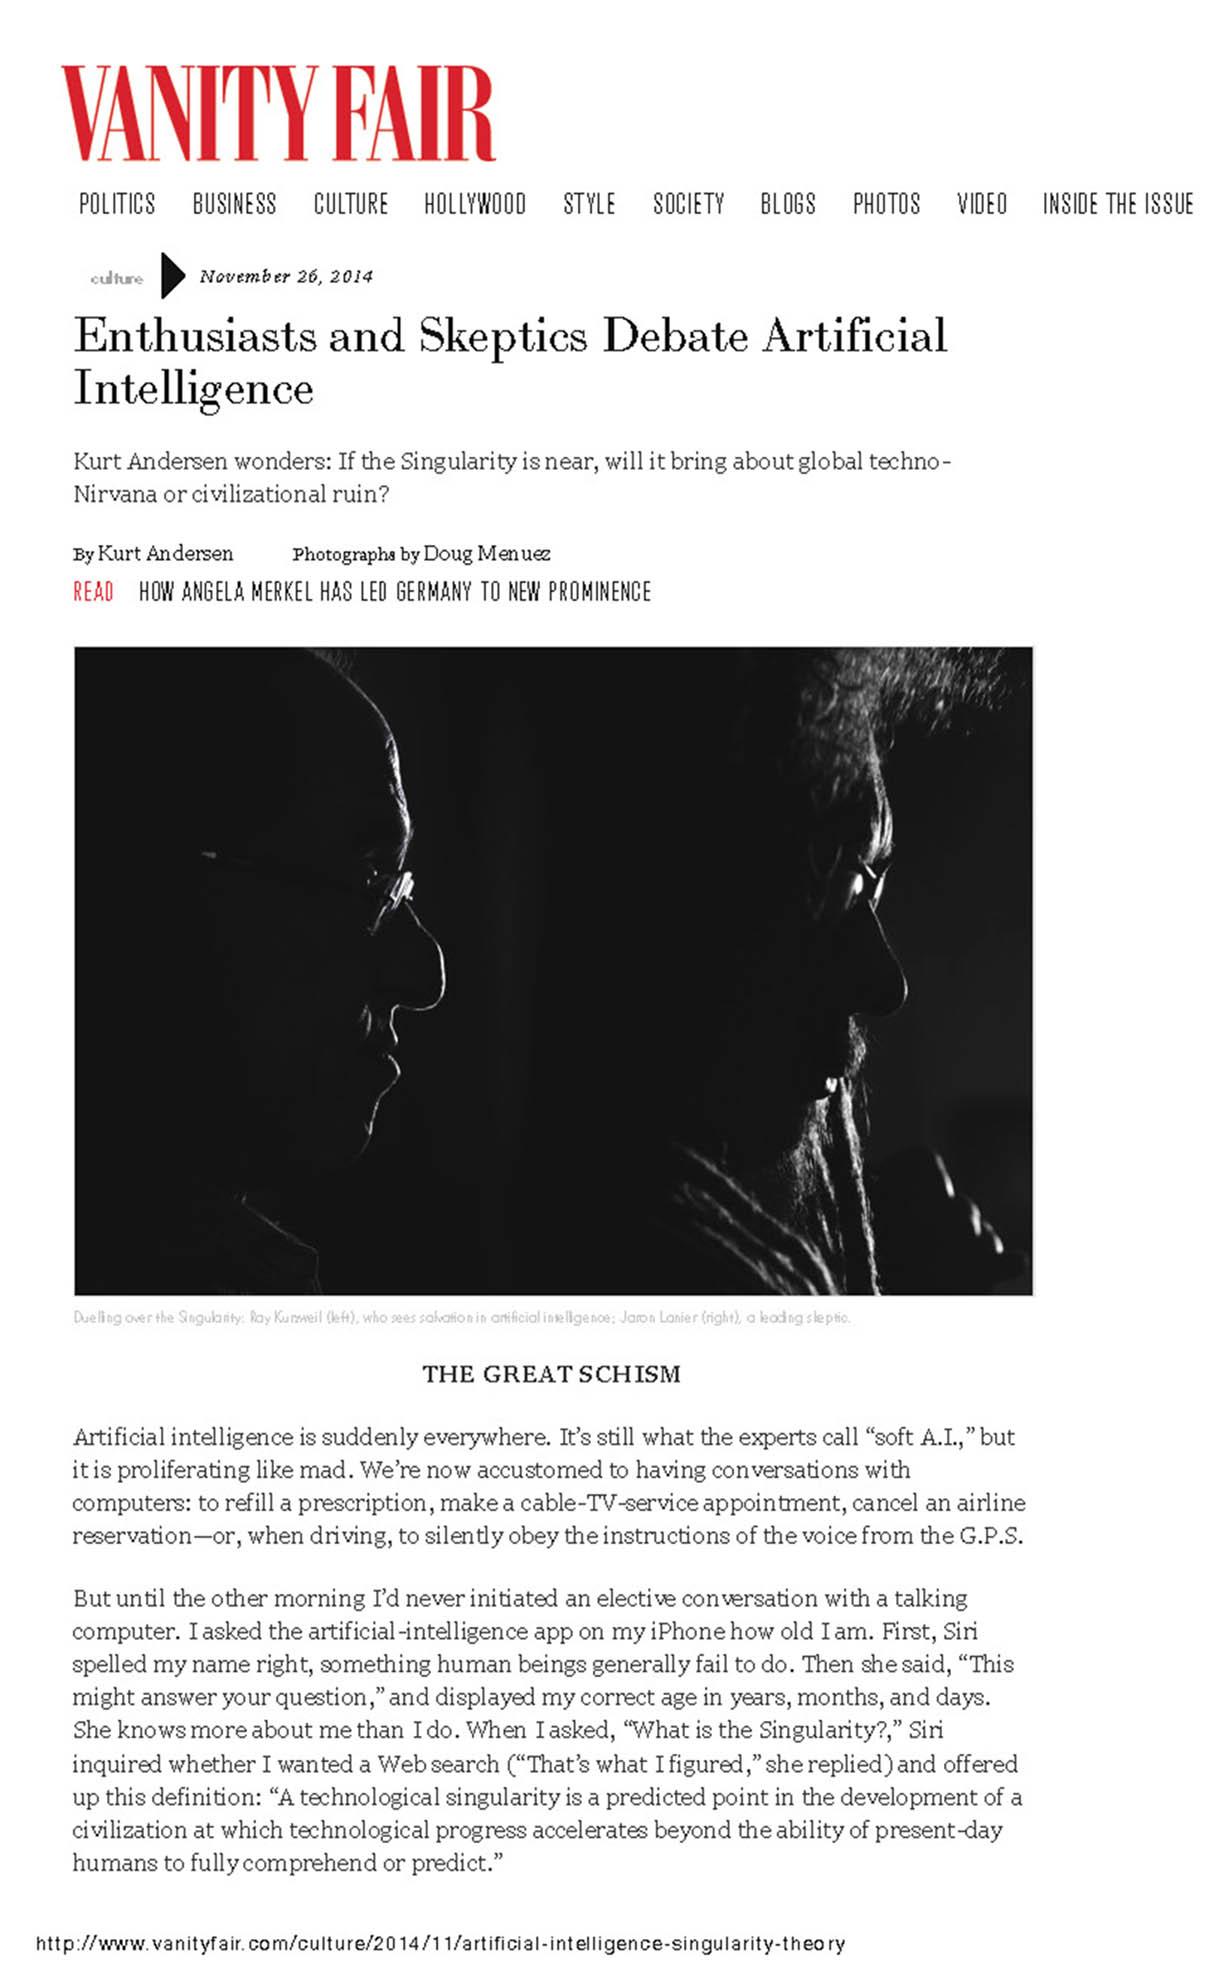 Pages+from+VANITY+FAIR_Enthusiasts+and+Skeptics+Debate+Artificial+Intelligence+-+Vanity+Fair.jpg